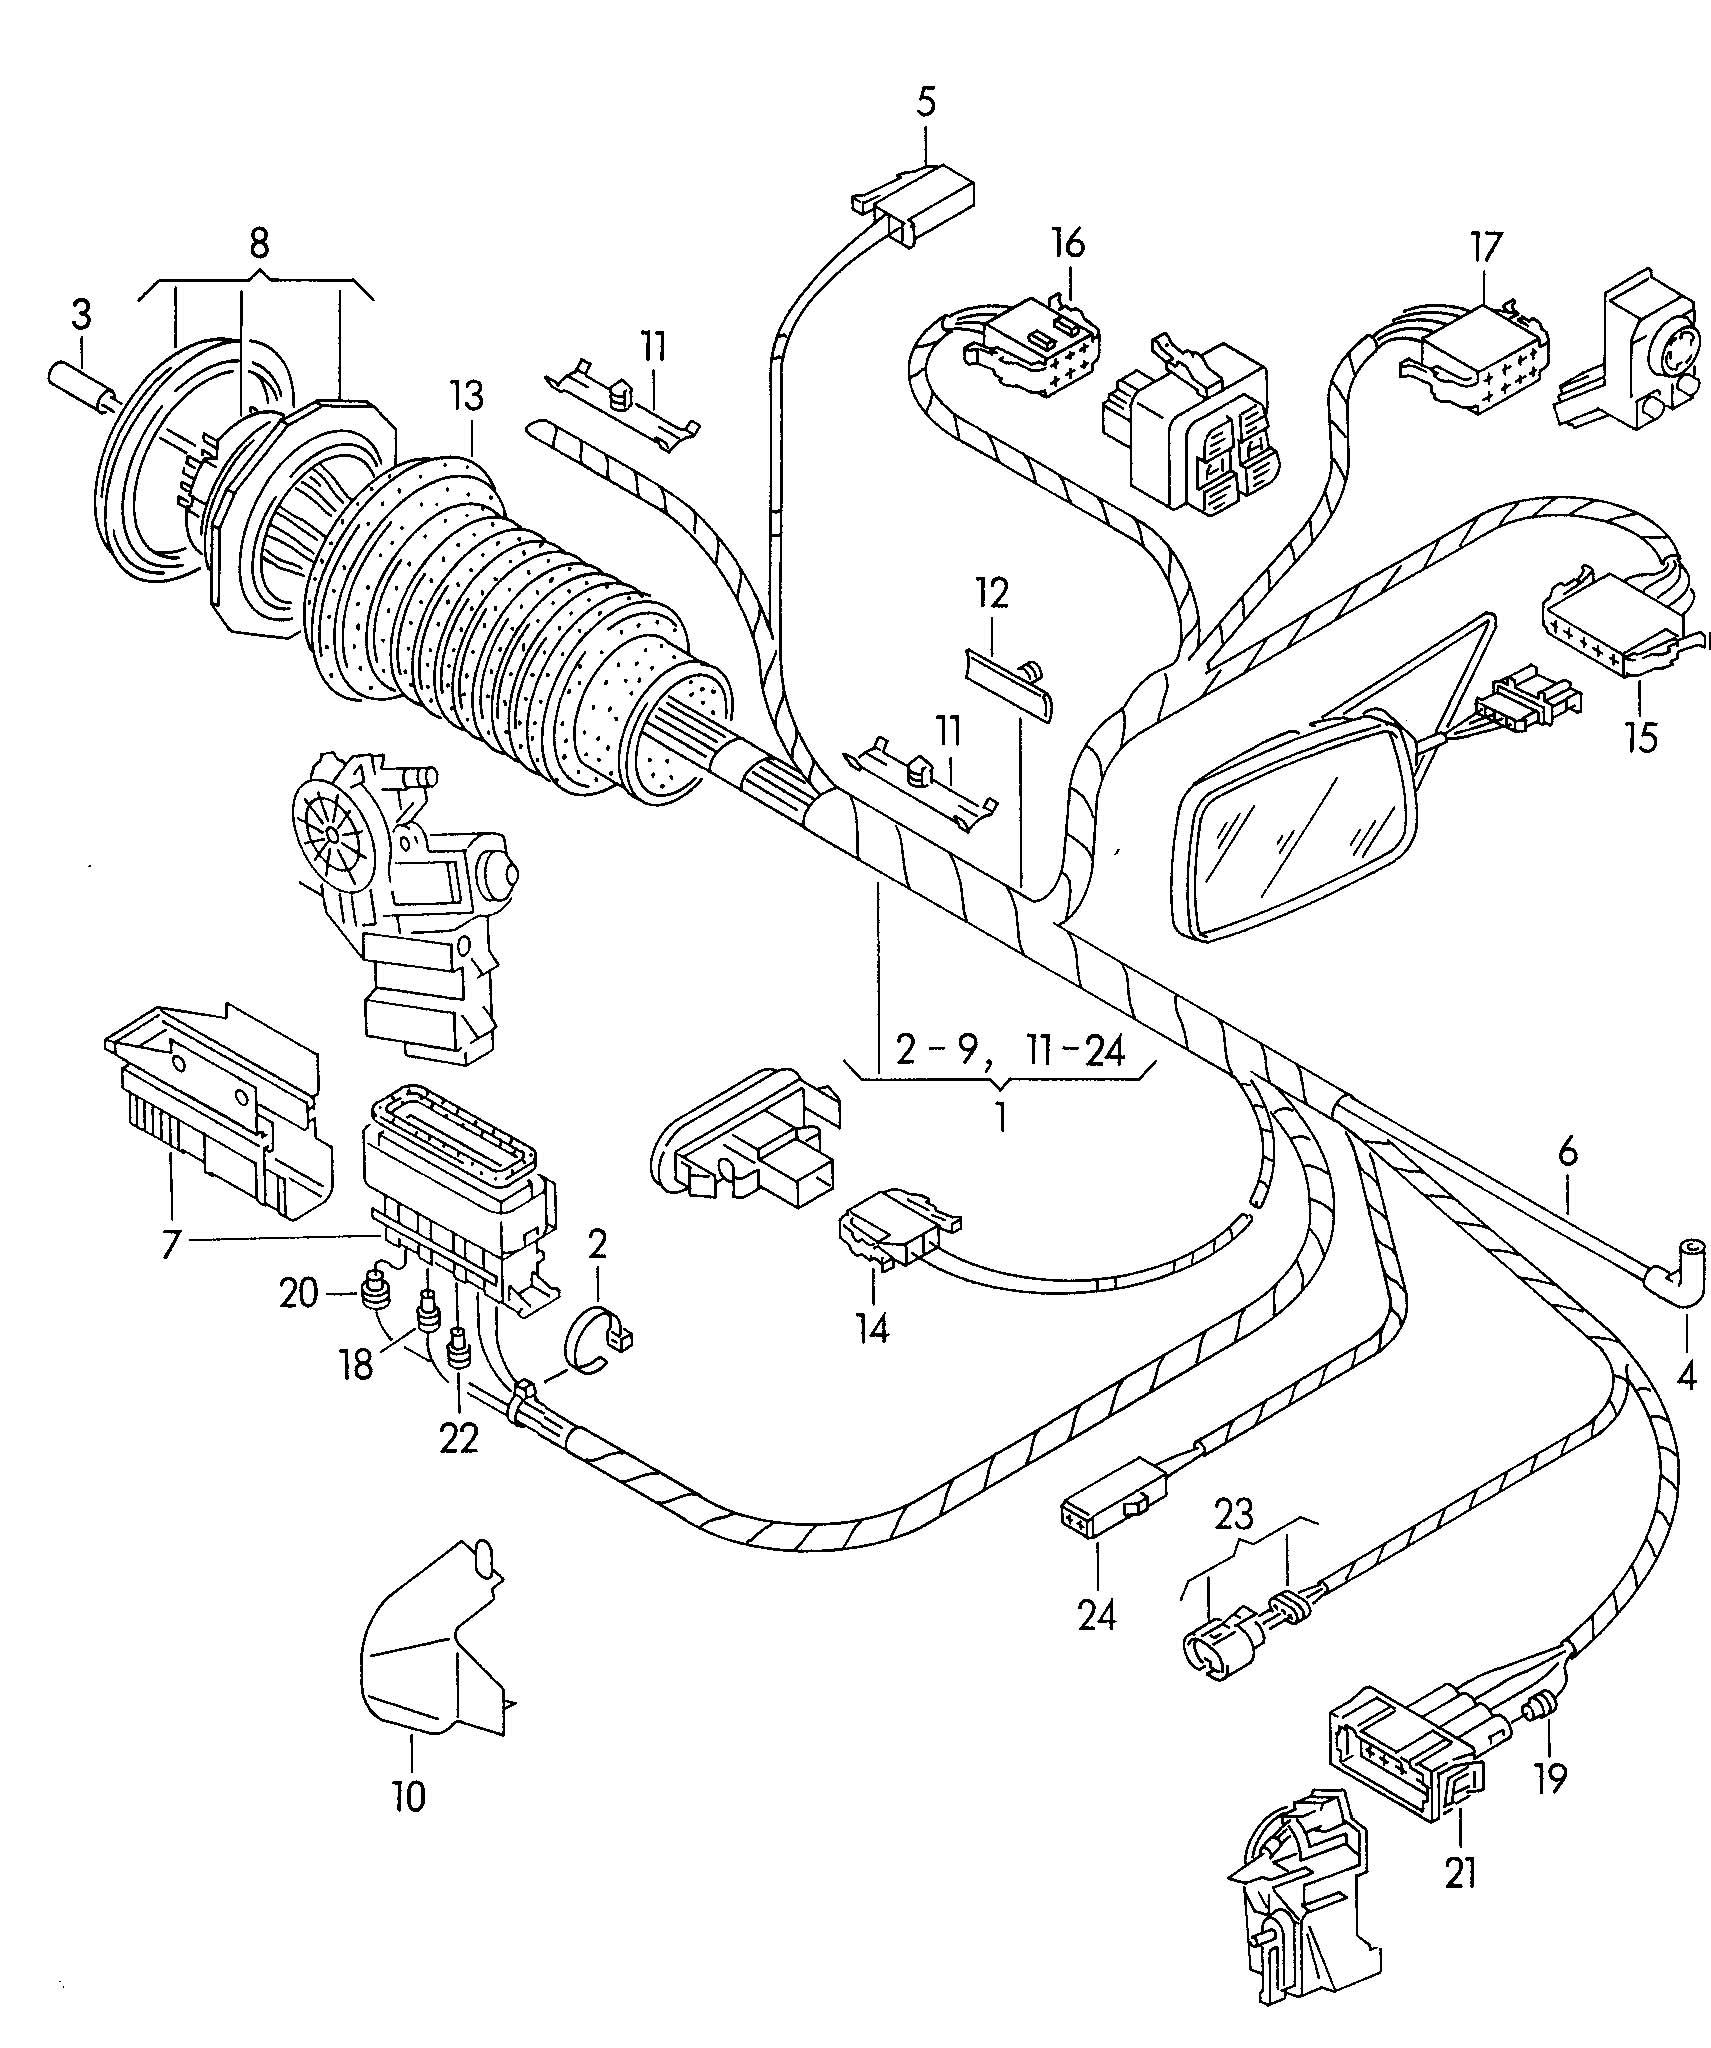 Volkswagen Passat 1 9l Tdi Adapter Wiring Harness